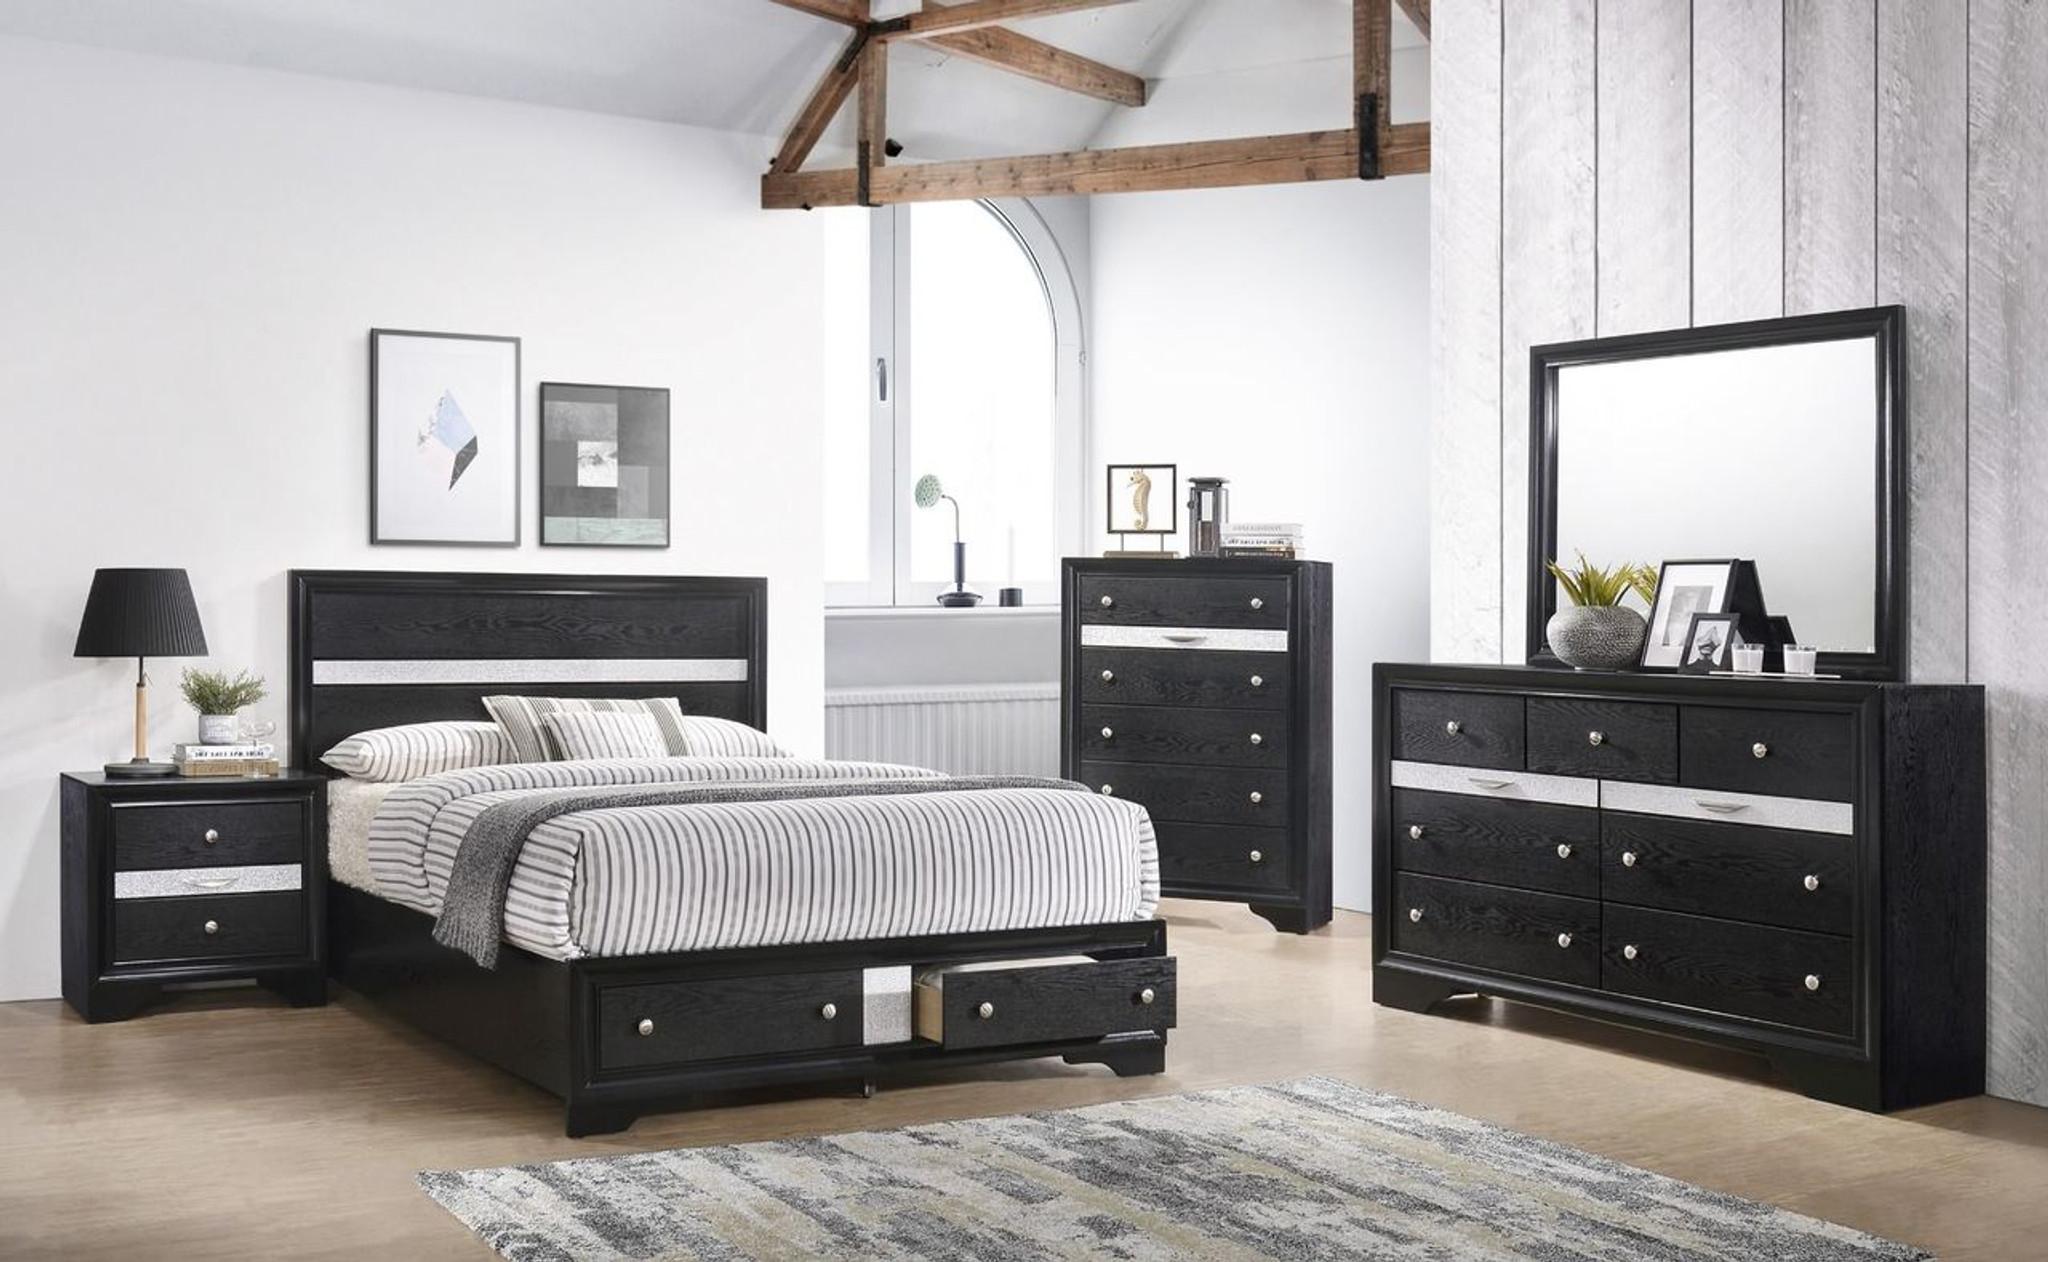 B4670-6 PCS 6 Regata Black Platform Bedroom SET By Crown Mark